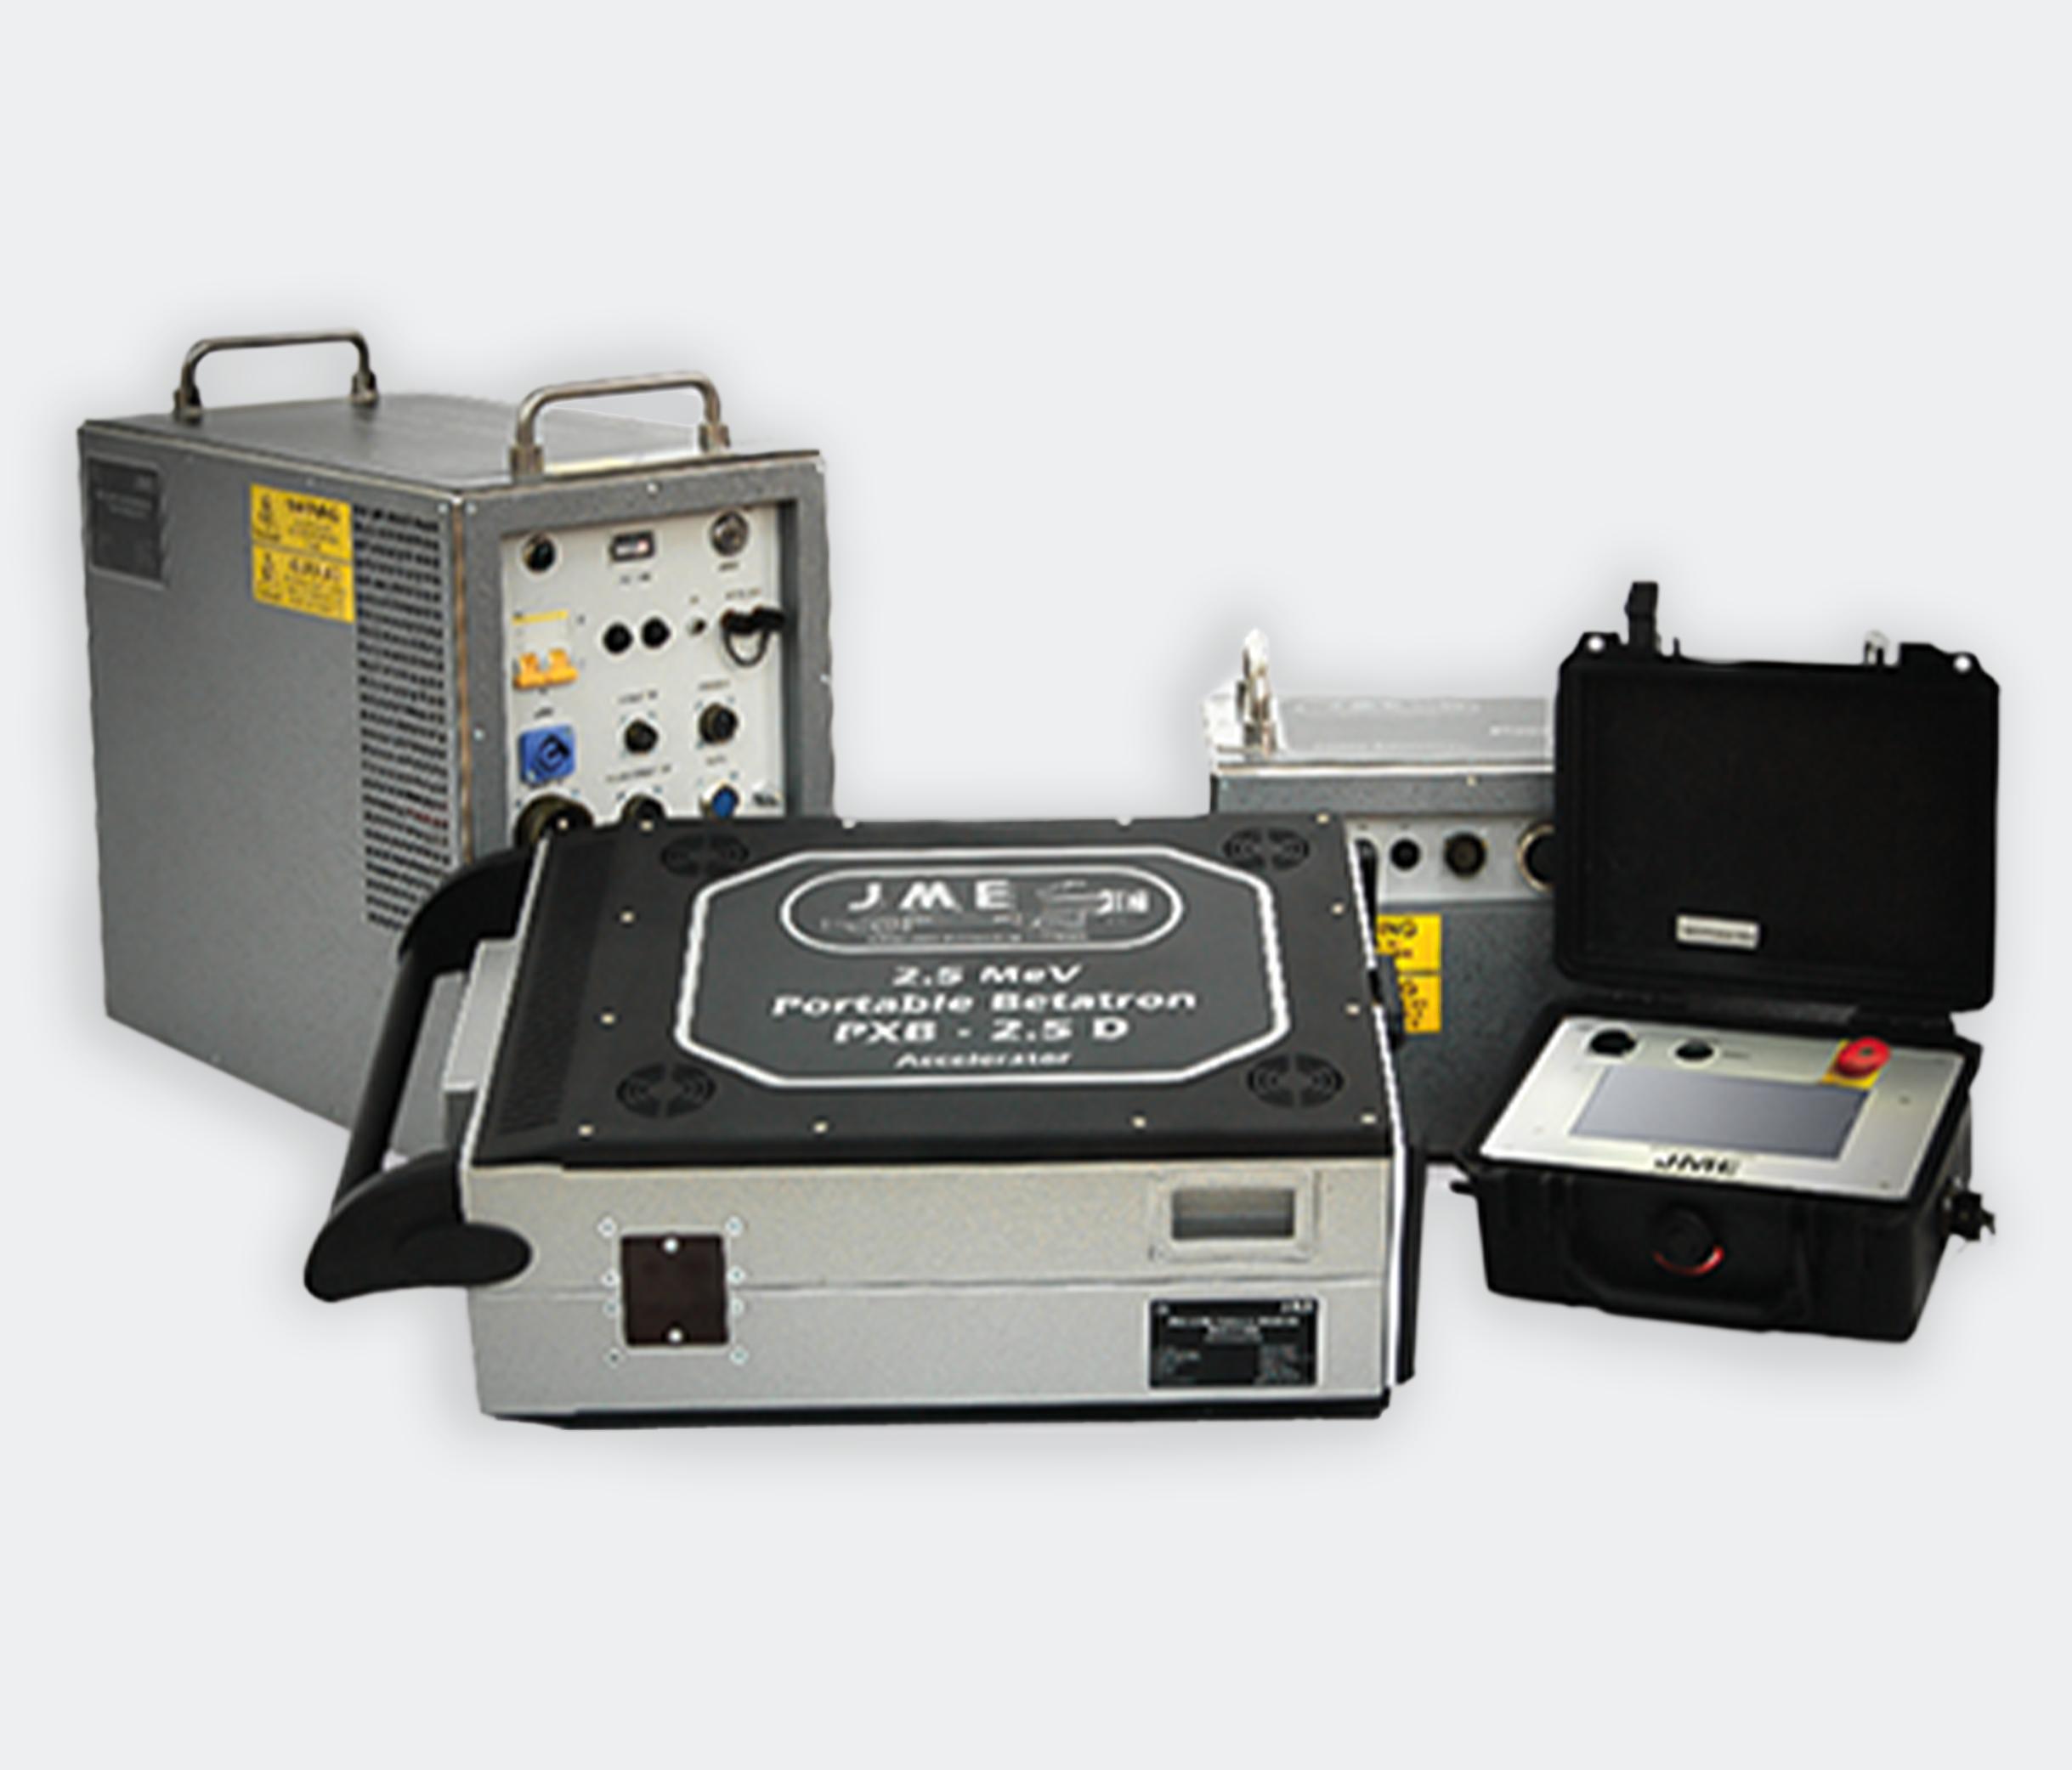 JME portable Betatron systems